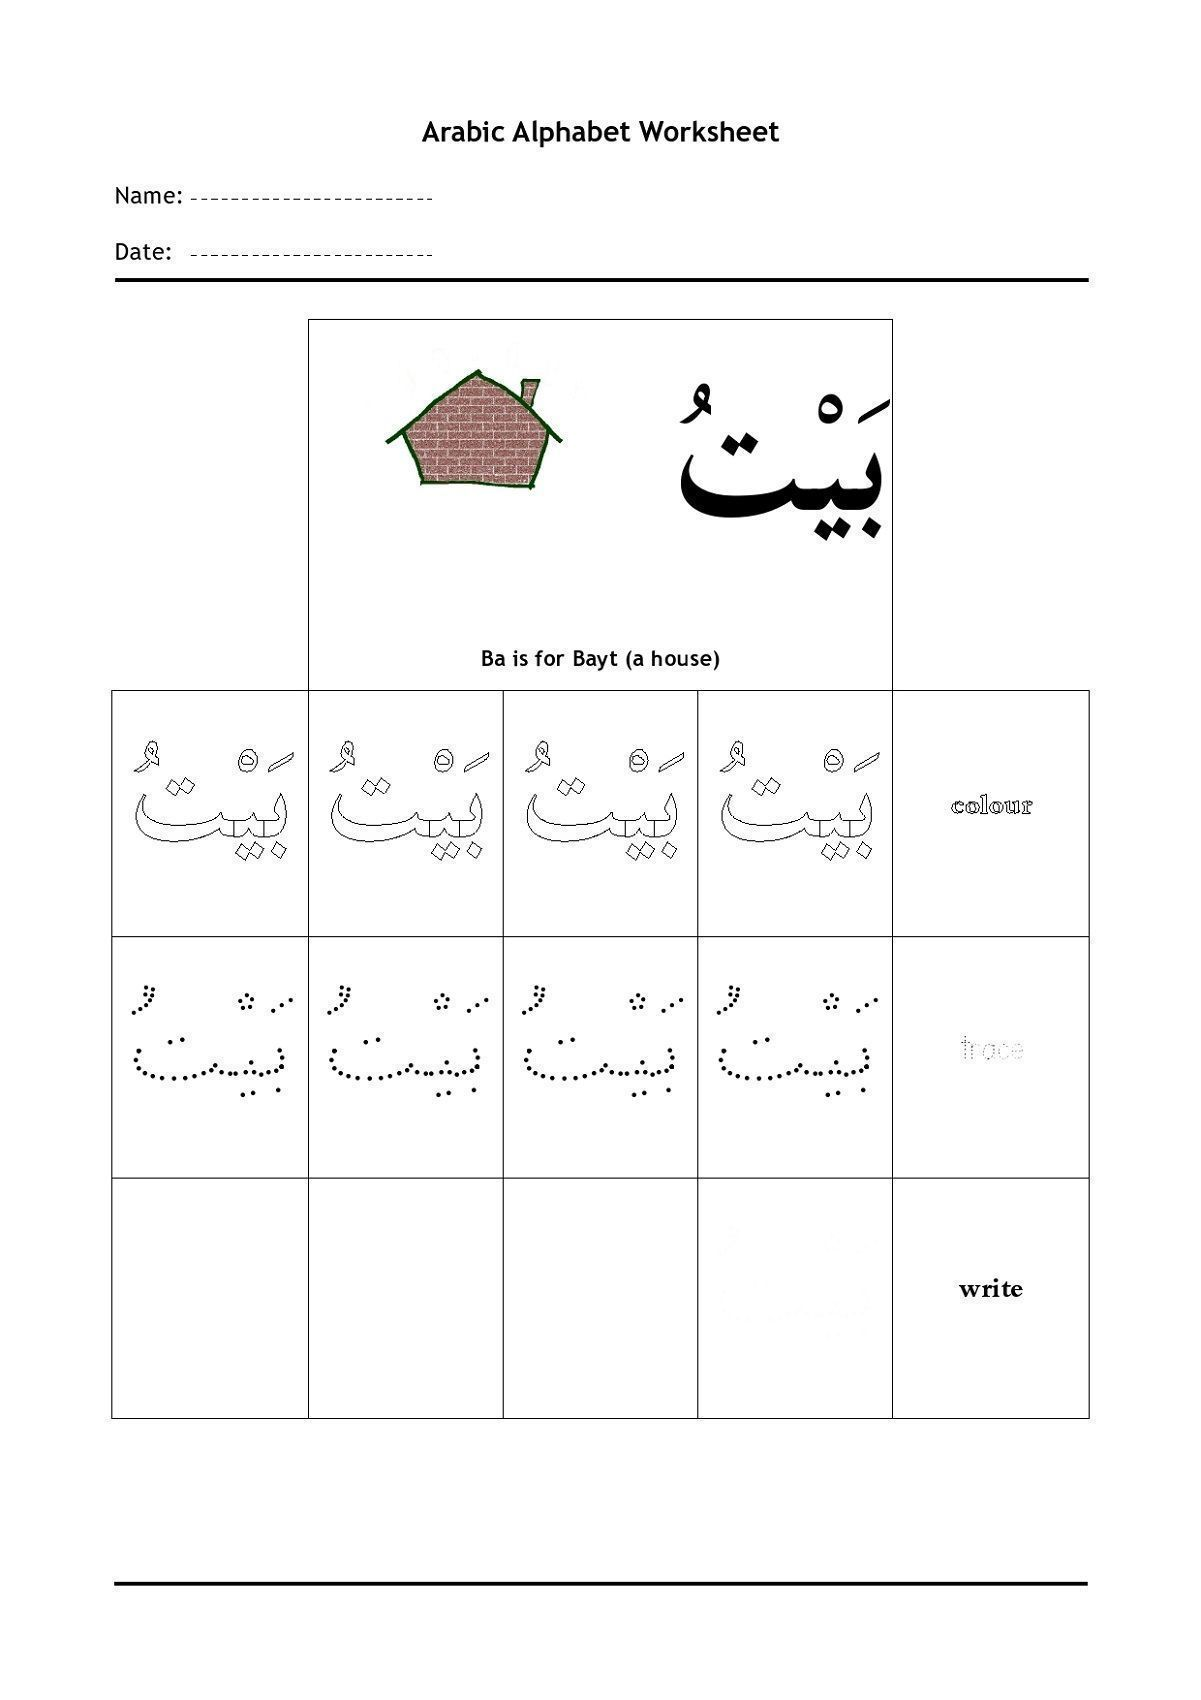 Arabic Alphabet Worksheets For Arabic Language Learning Learnarabicforchildren